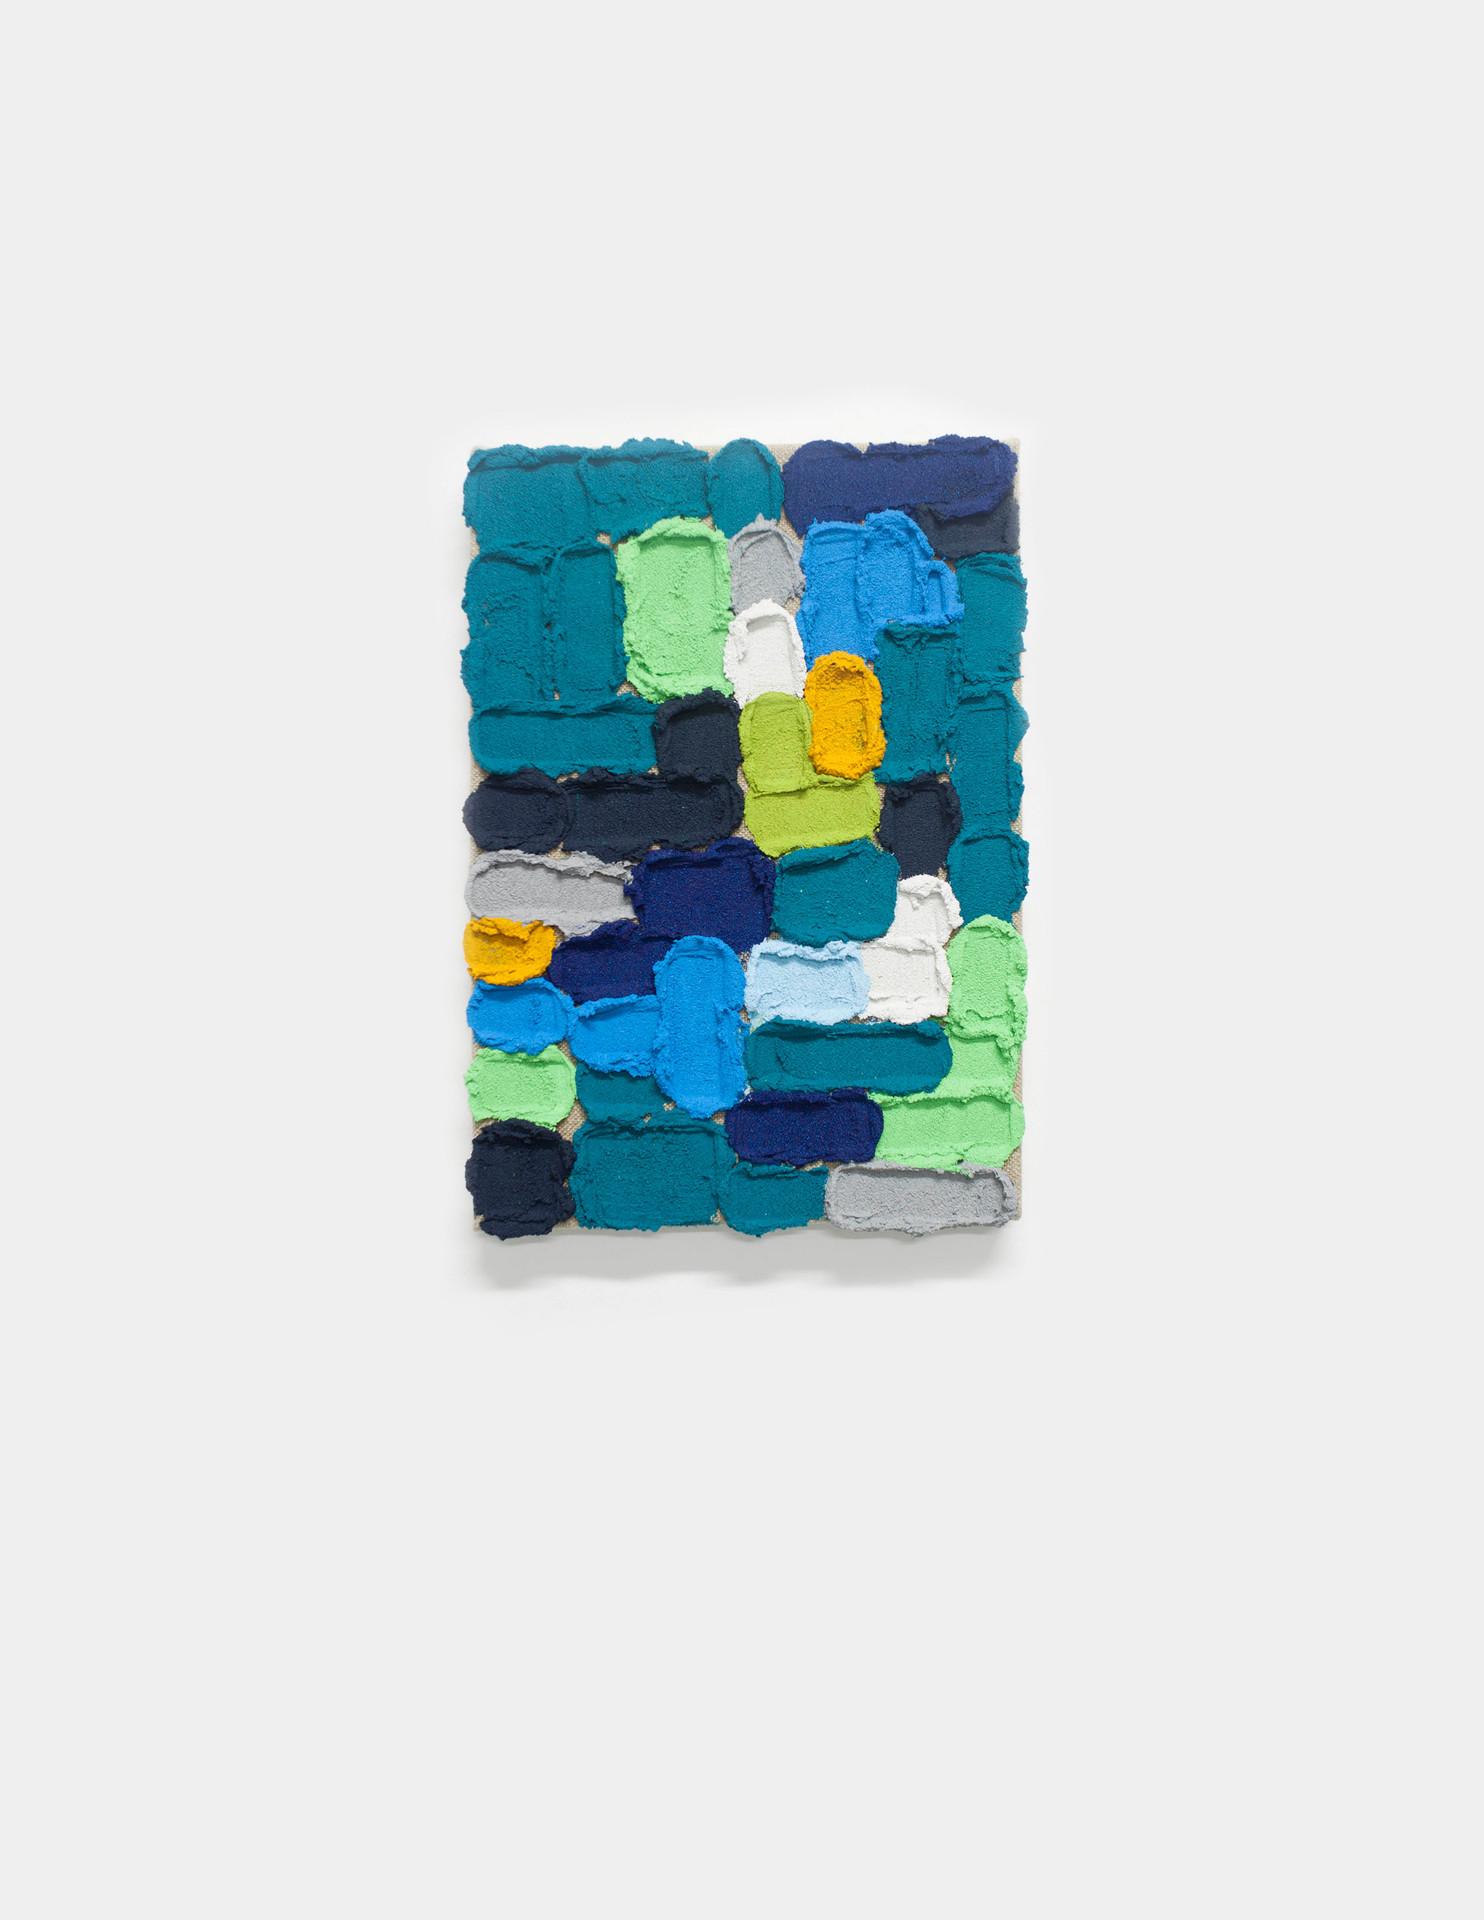 Pintura O011, 2019. Acrylic, sand and limestone on linen. 38 x 27 cm.